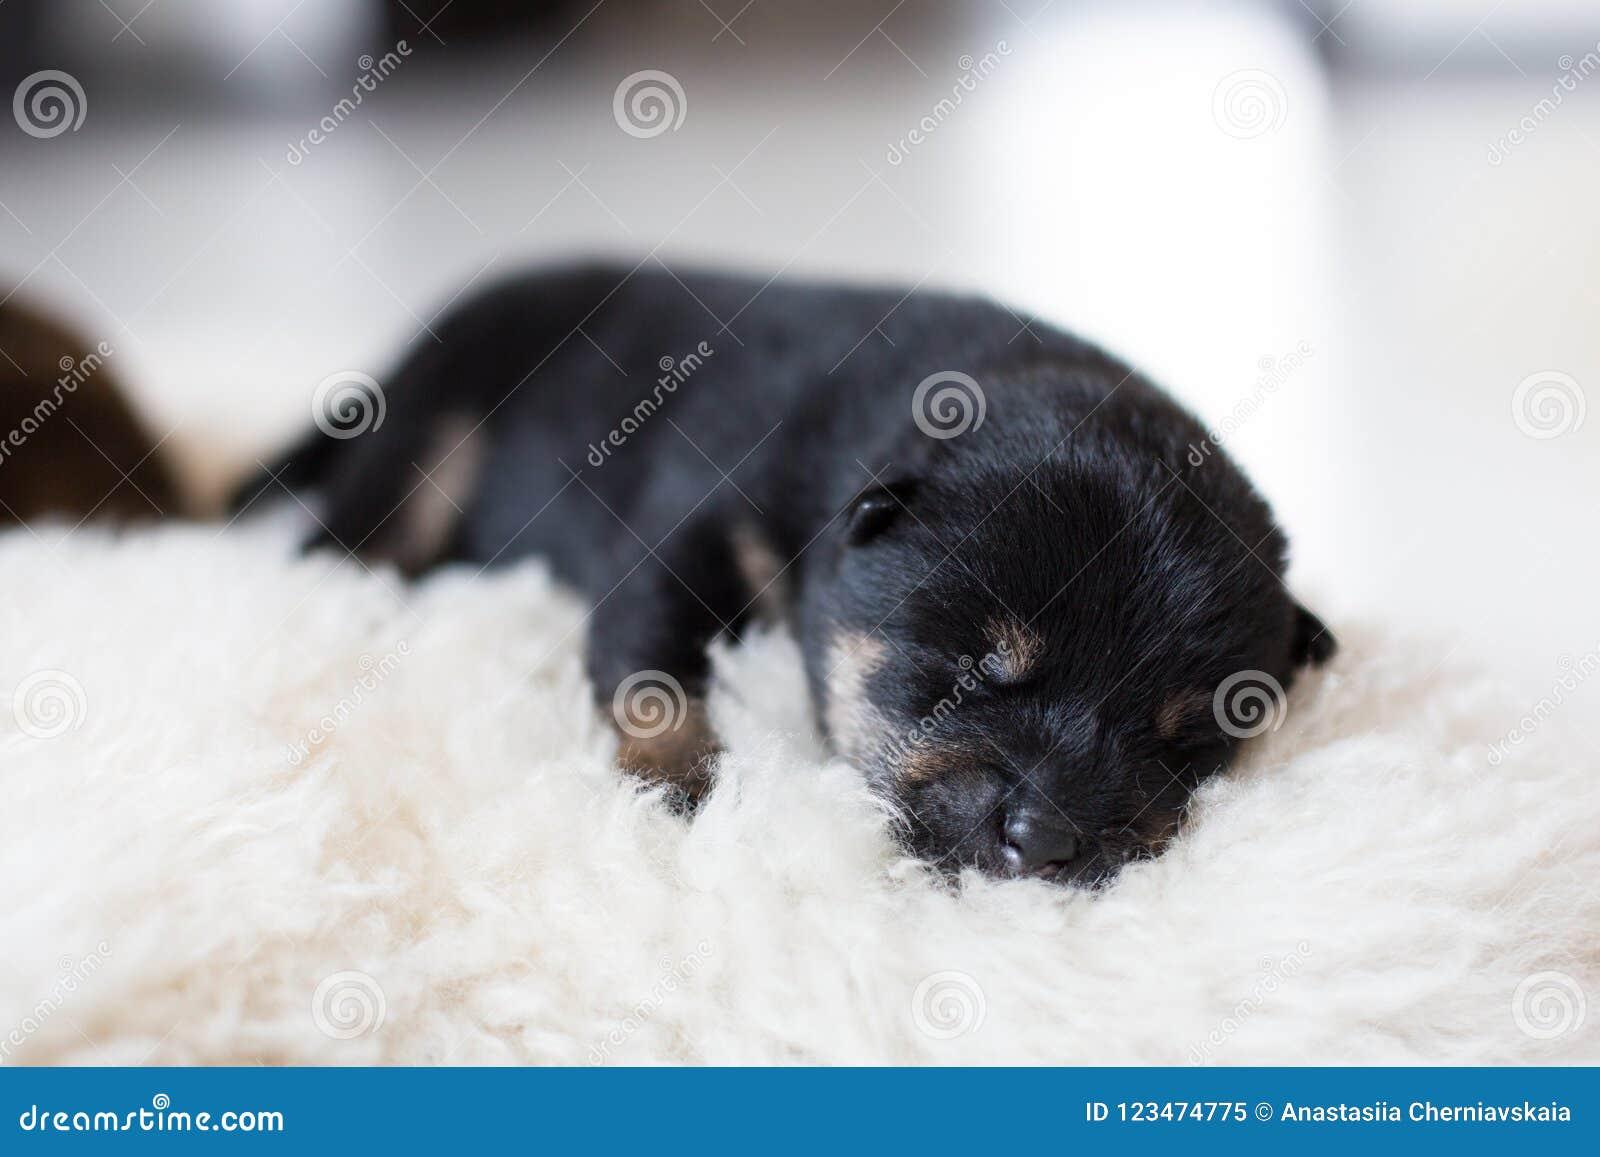 Close Up Portrait Of Beautiful Newborn Black And Tan Shiba Inu Puppy Sleeping On The Blanket Stock Image Image Of Sleep Indoor 123474775